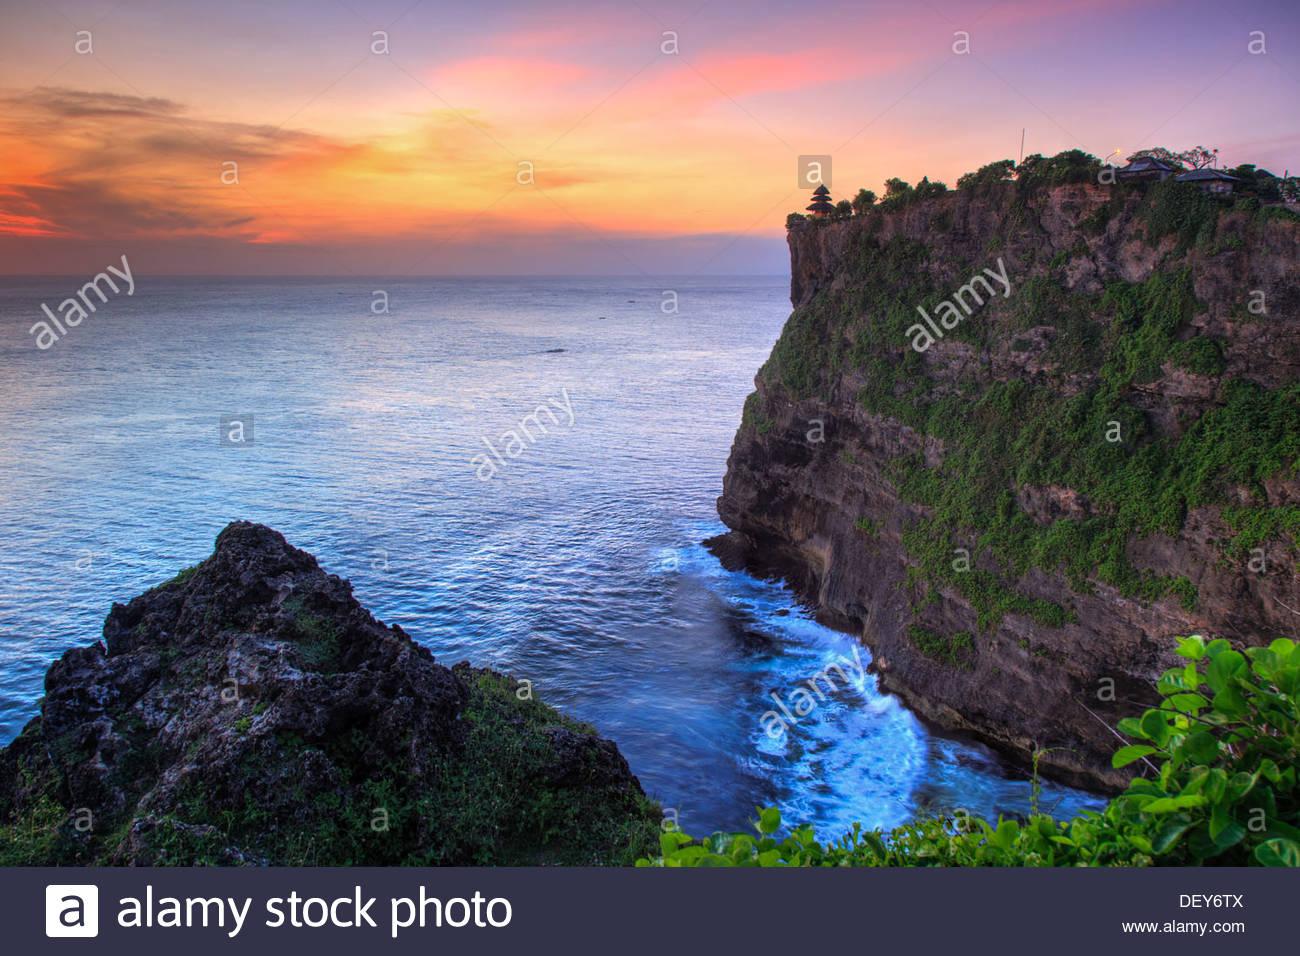 Bali Bukit Peninsula Uluwatu Pura Luhur Temple Sunset Important Directional